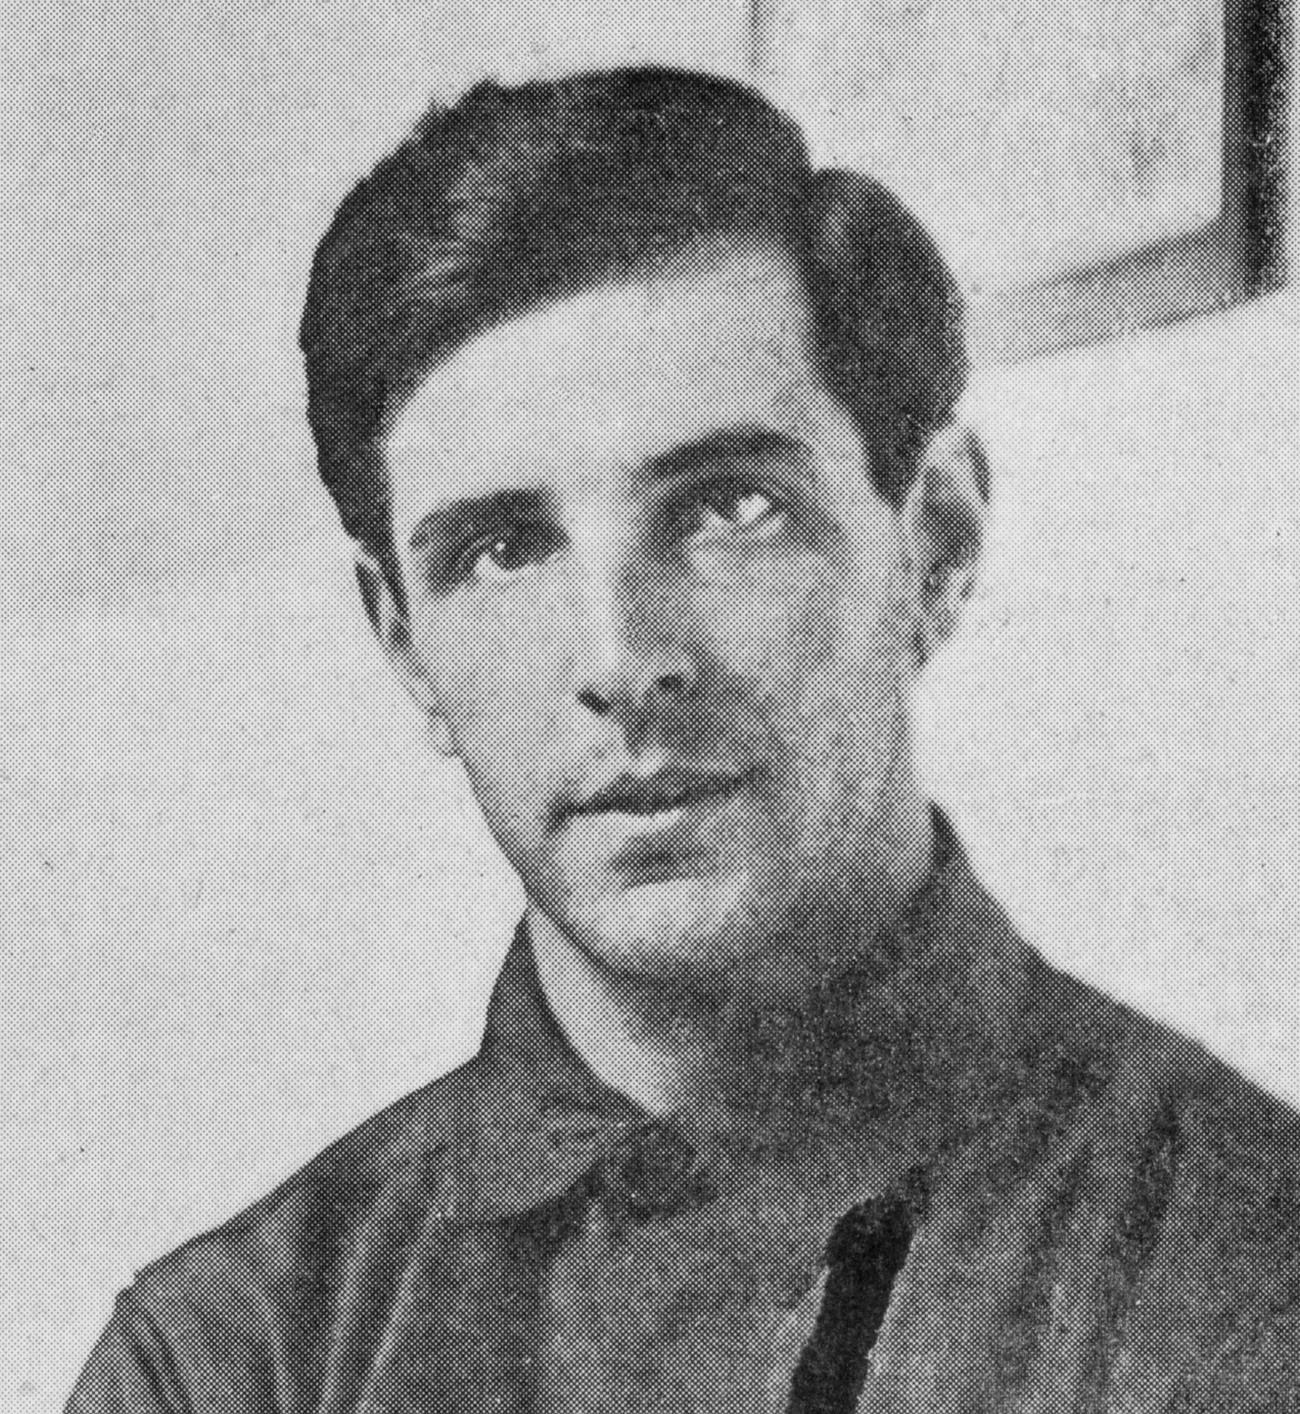 Peter Bianki